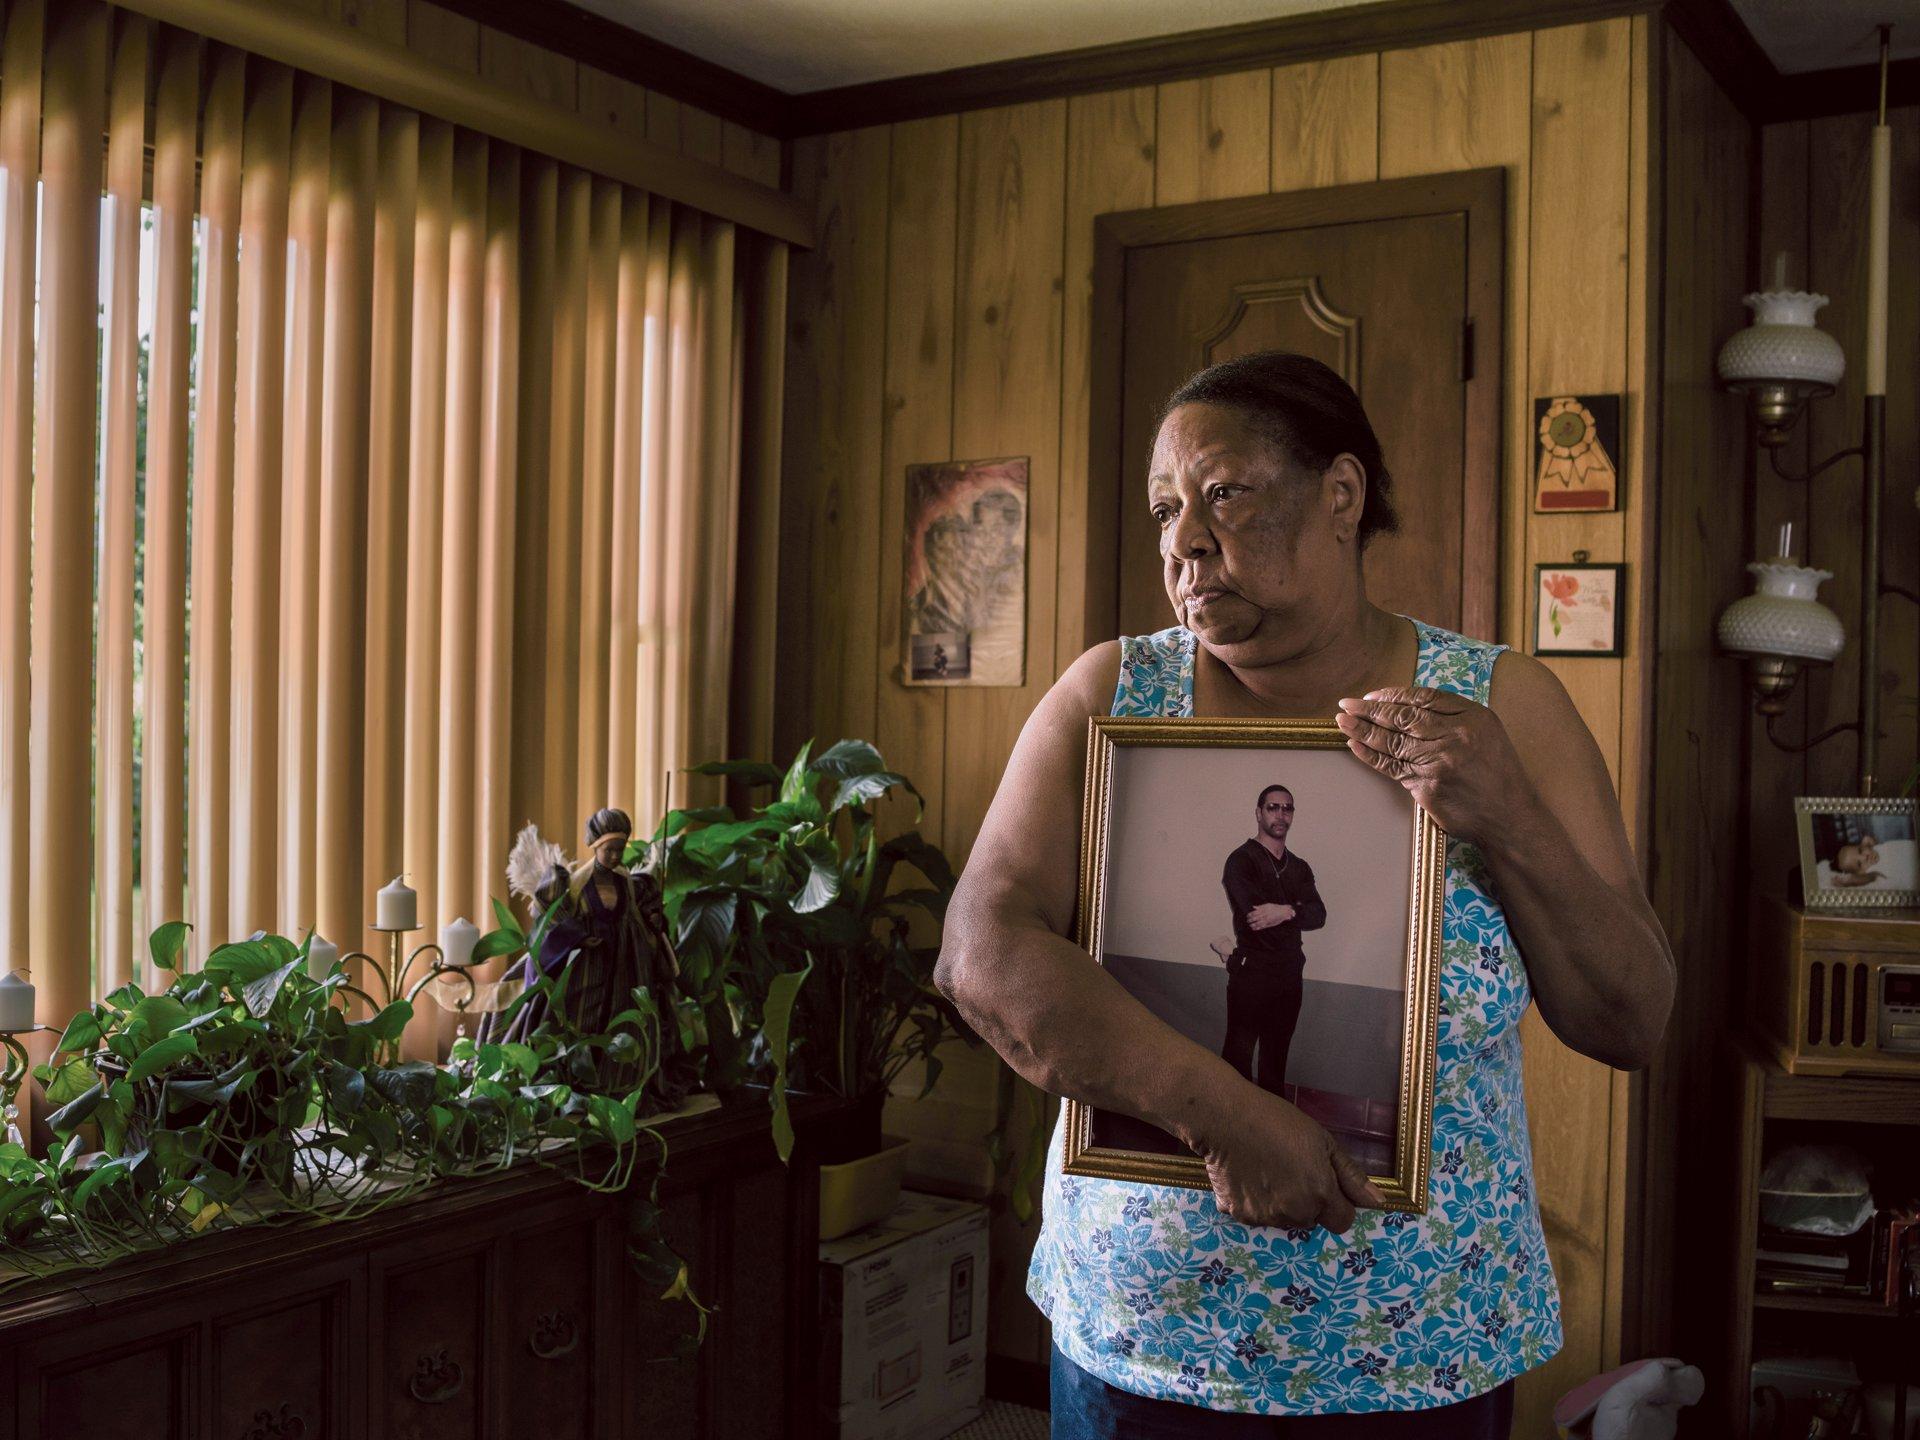 Ta-Nehisi Coates (Photo Credit: The Atlantic)